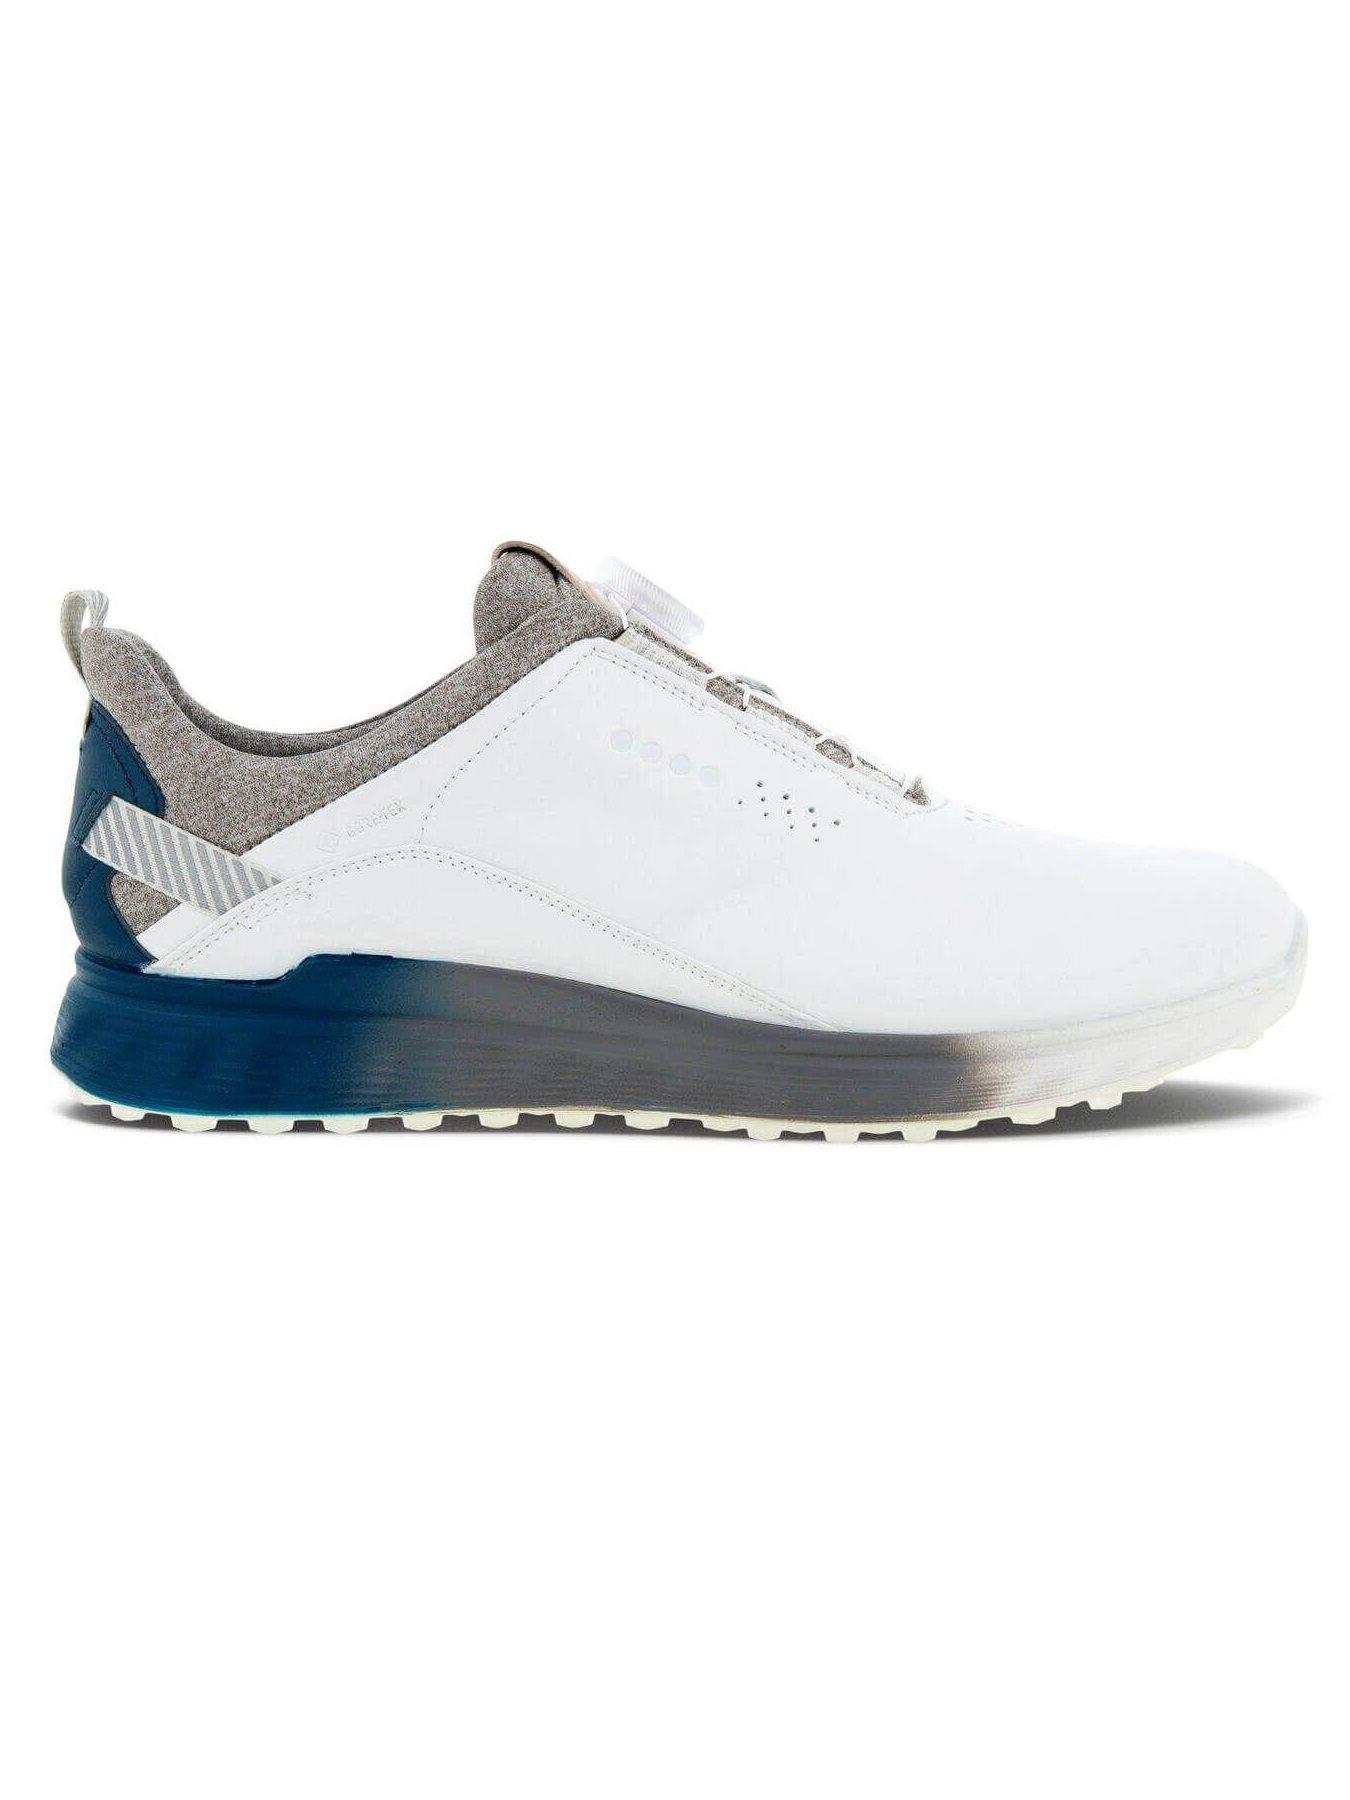 Ecco heren golfschoenen S-Three BOA wit